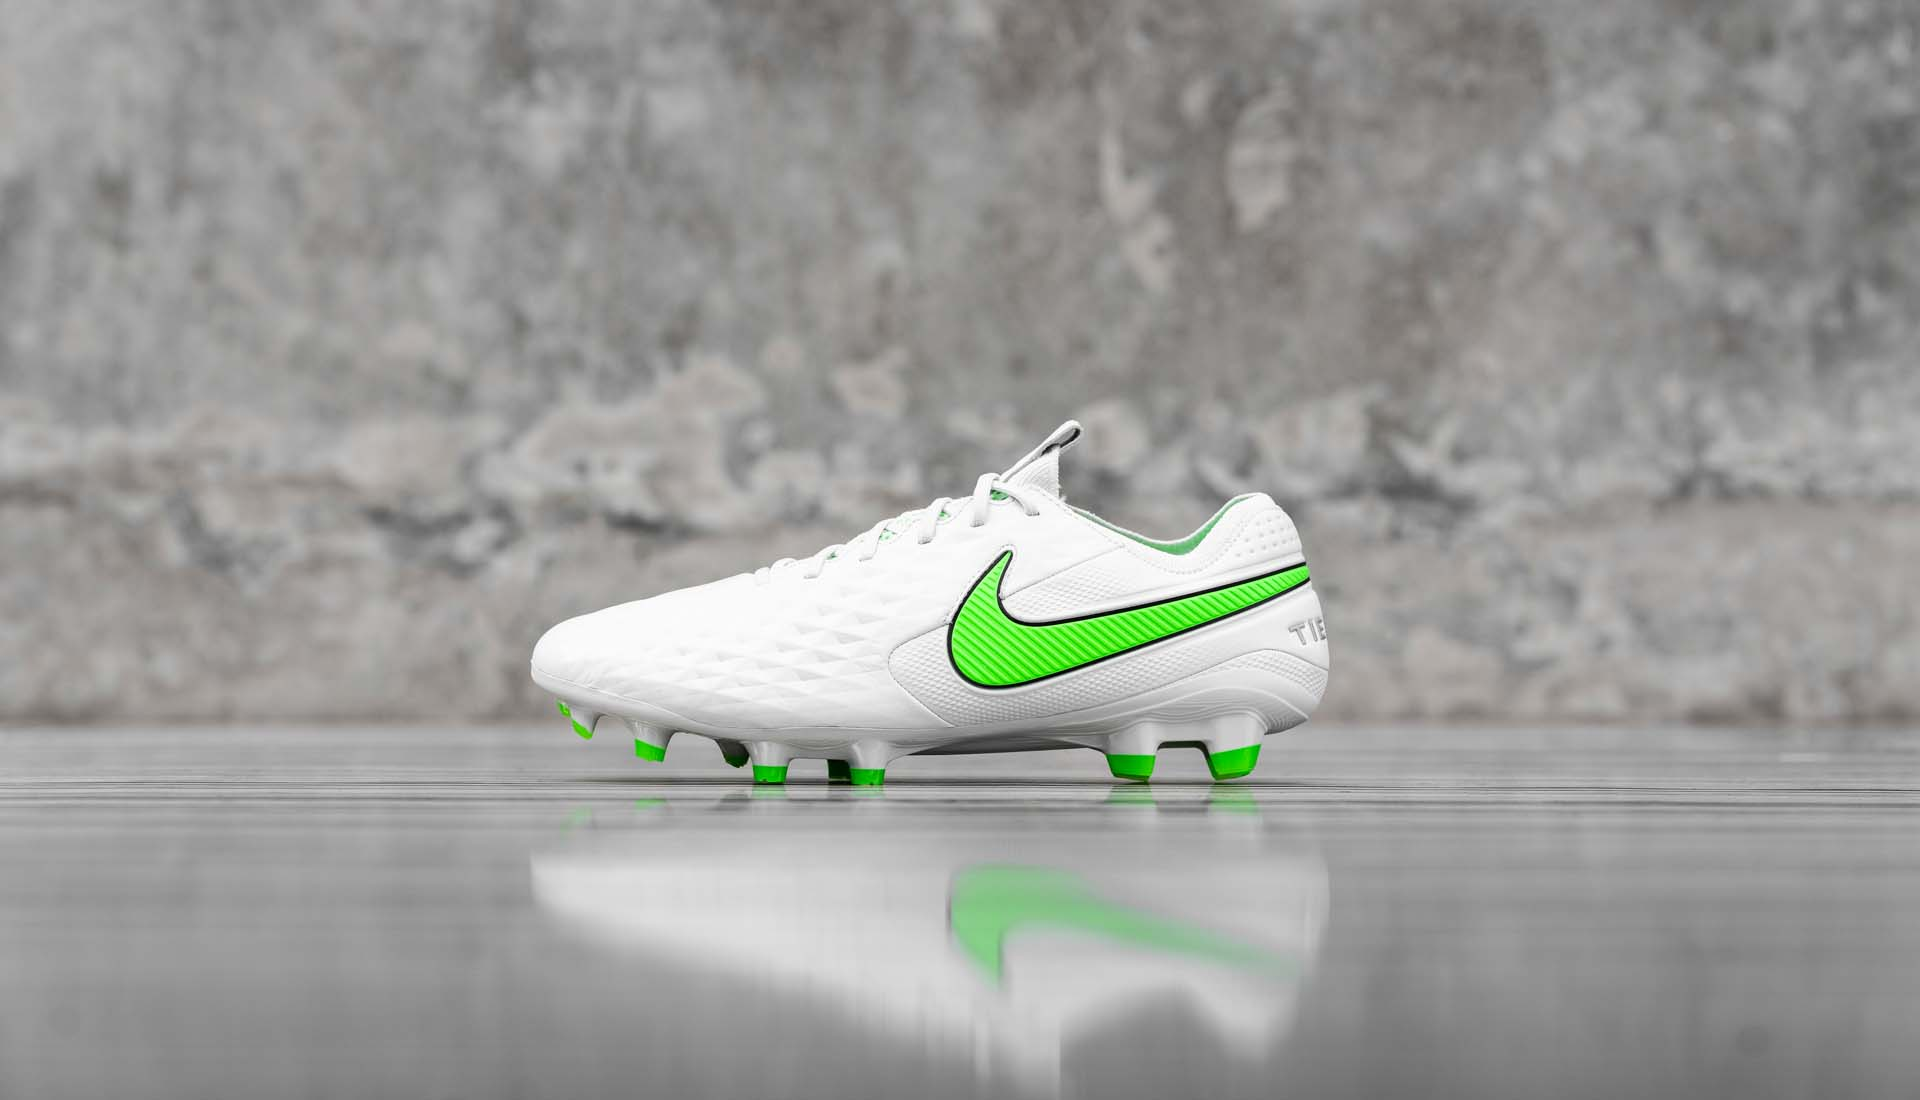 Giày đá bóng Nike Tiempo Legend VIII Spectrum Pack